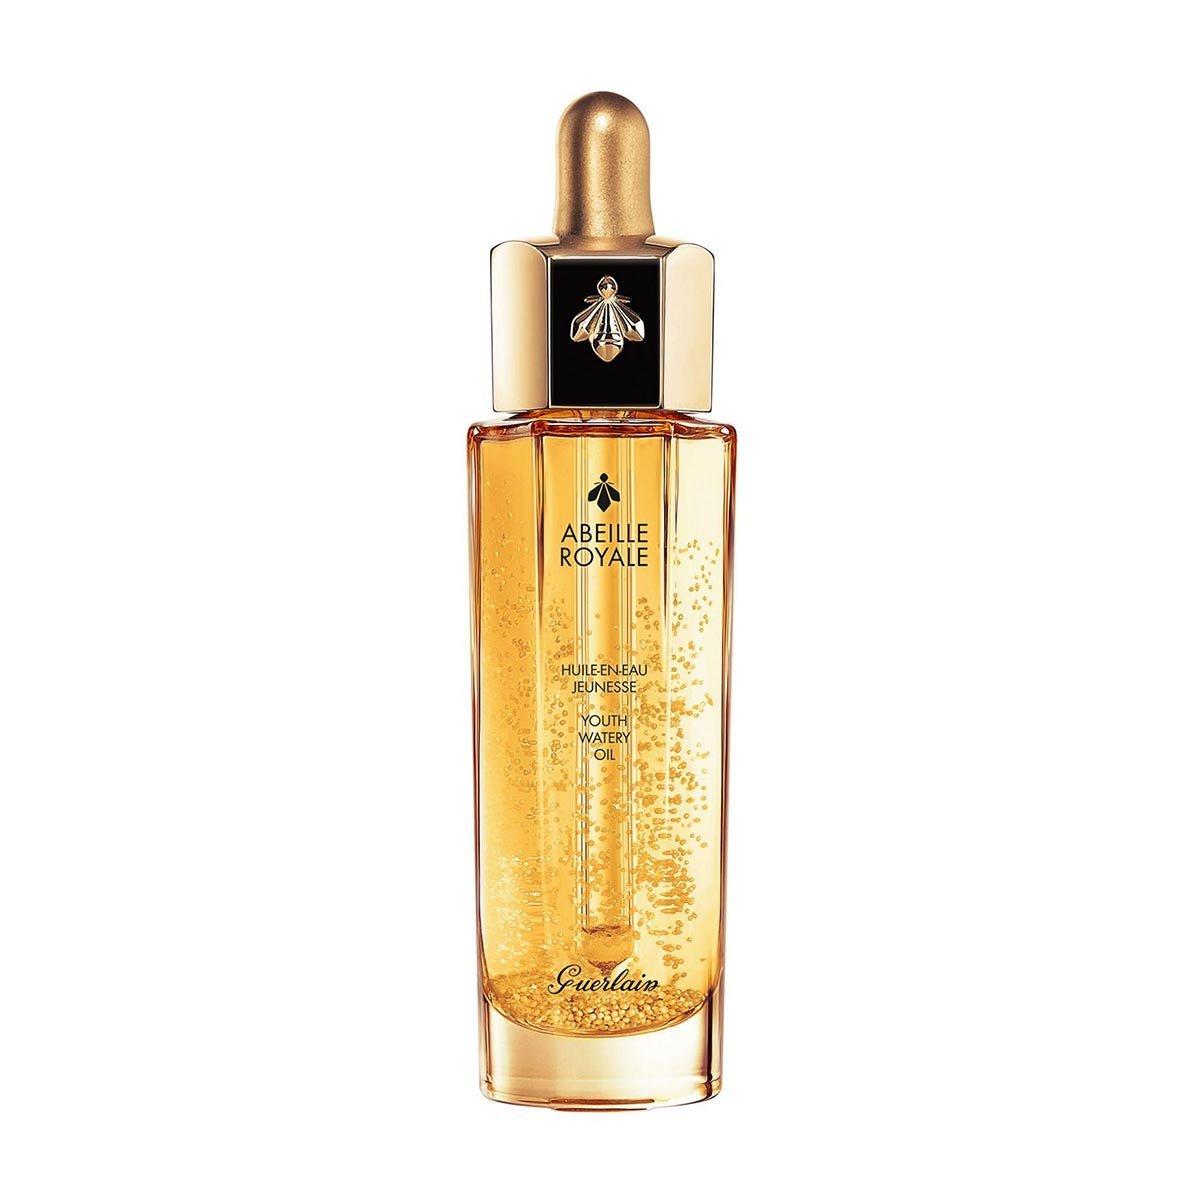 Guerlain Body Tonic - 50 ml 56137